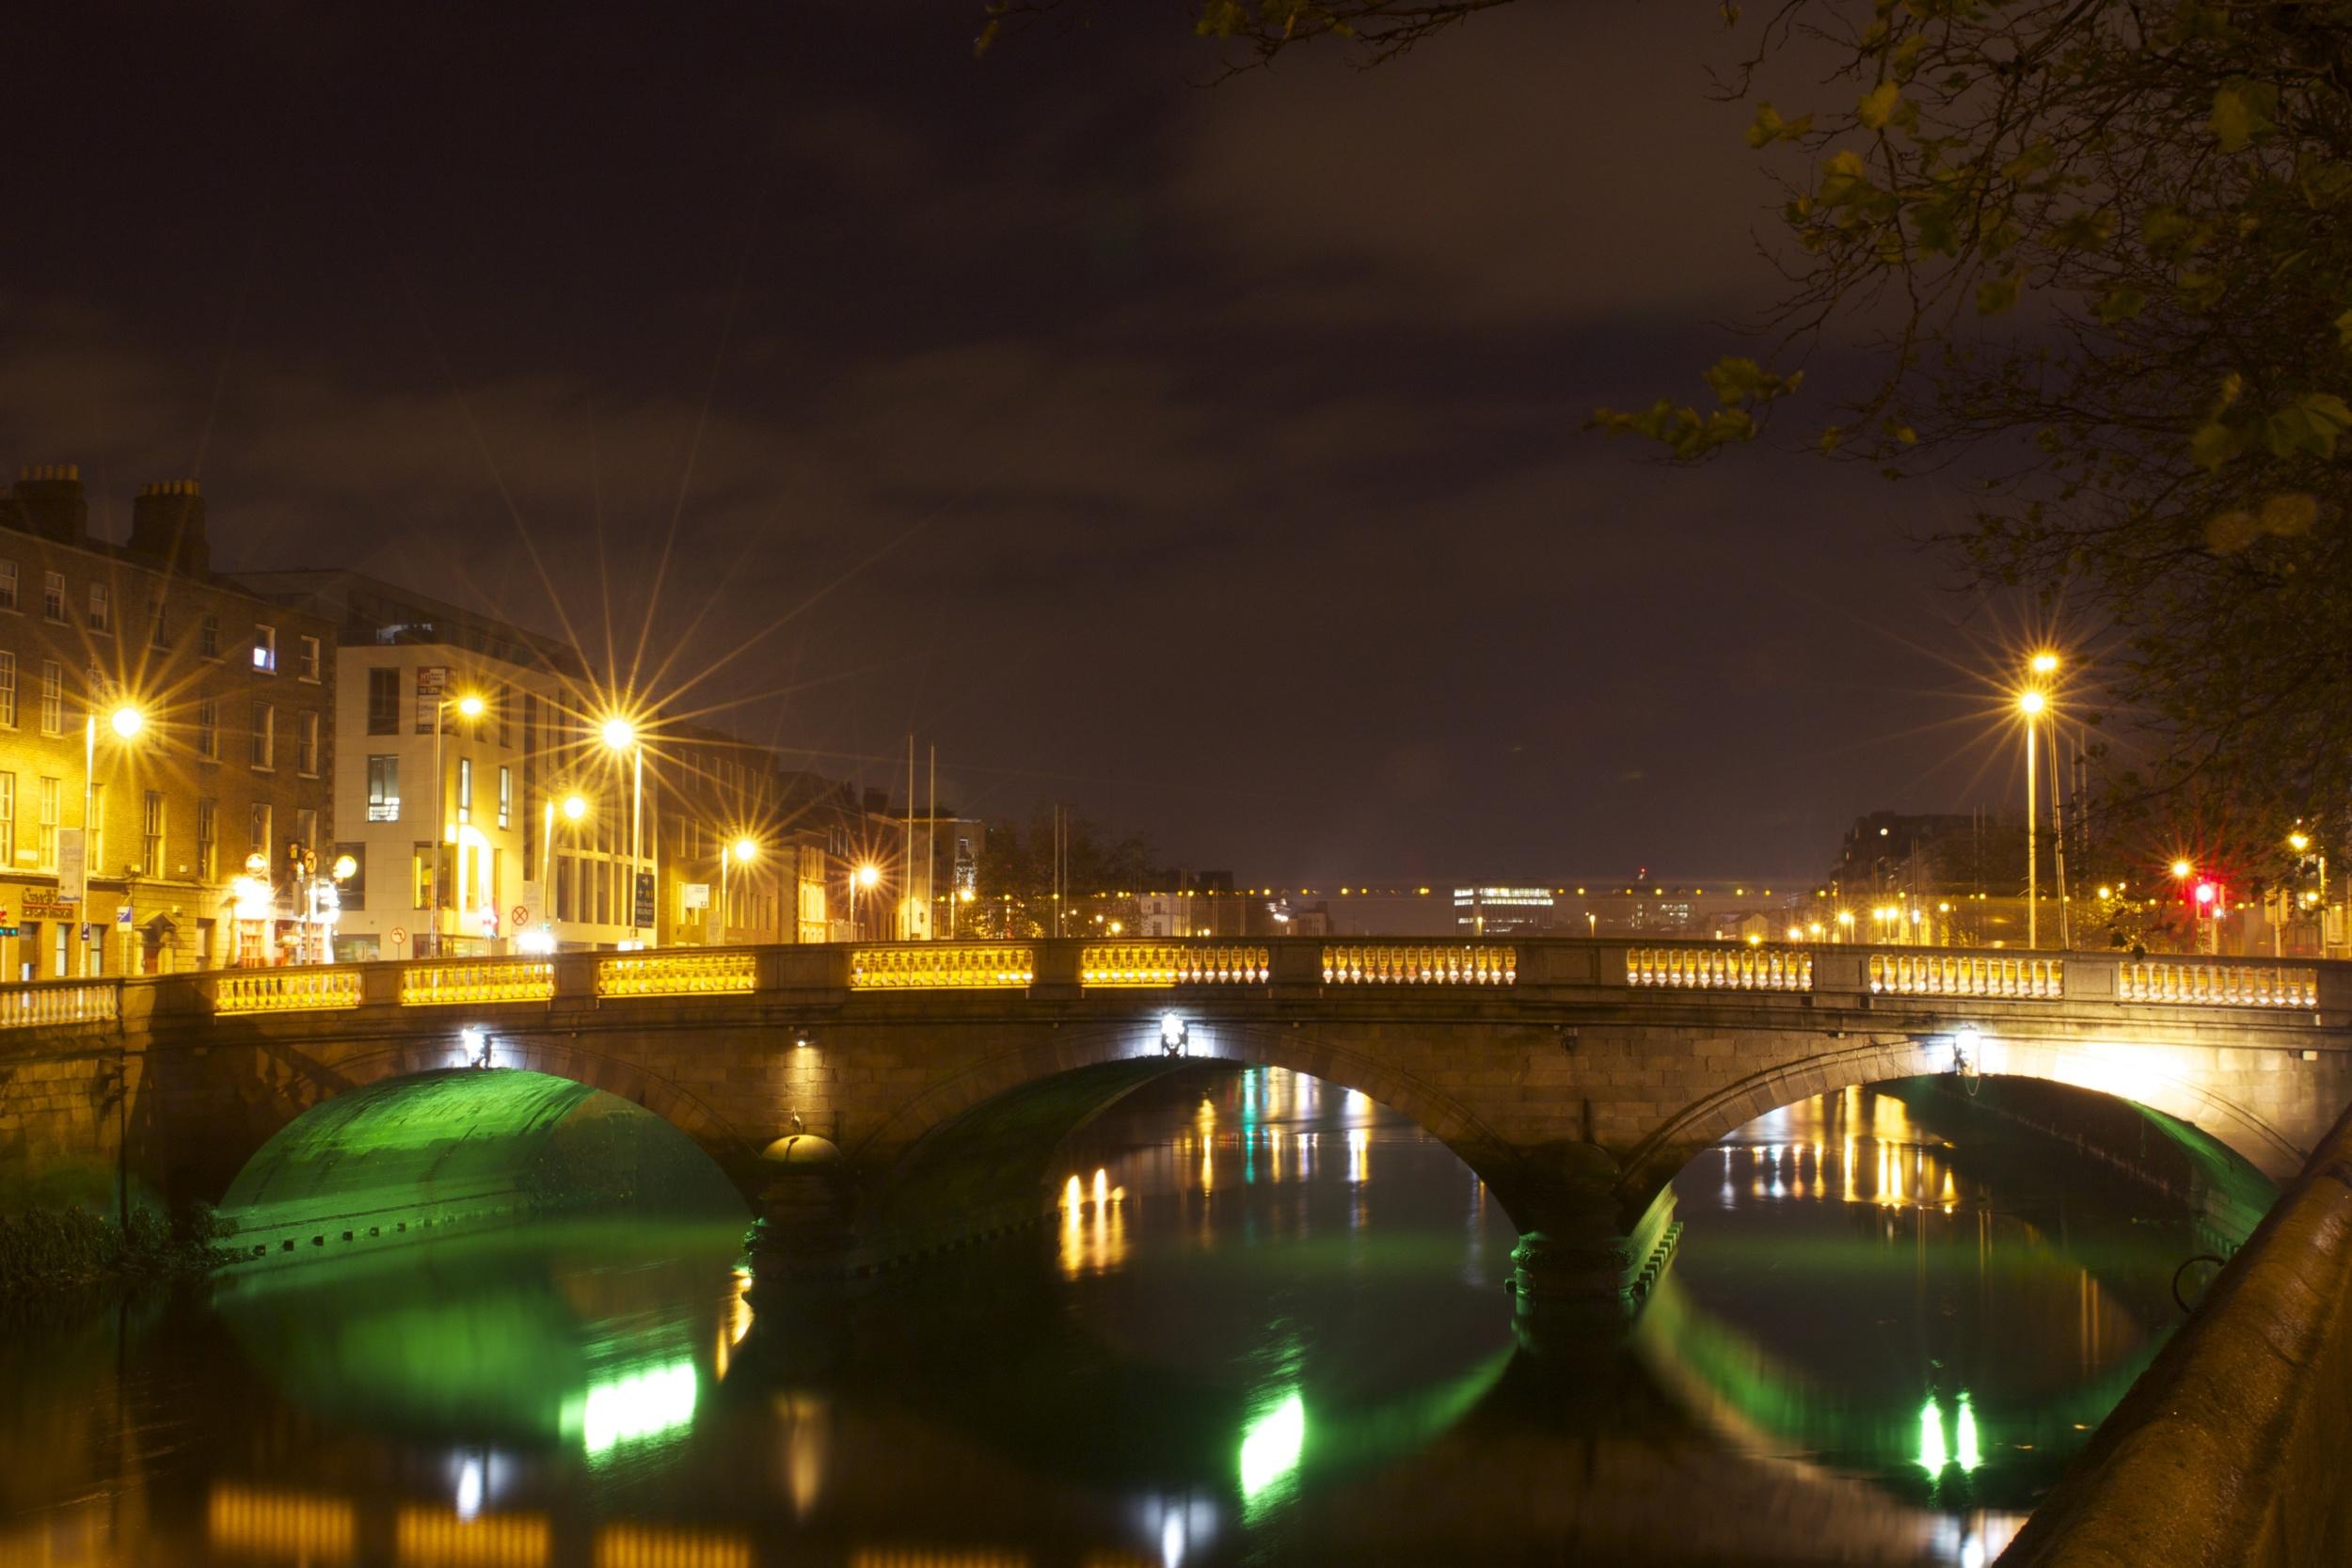 Dublin At Night - Grattan Bridge